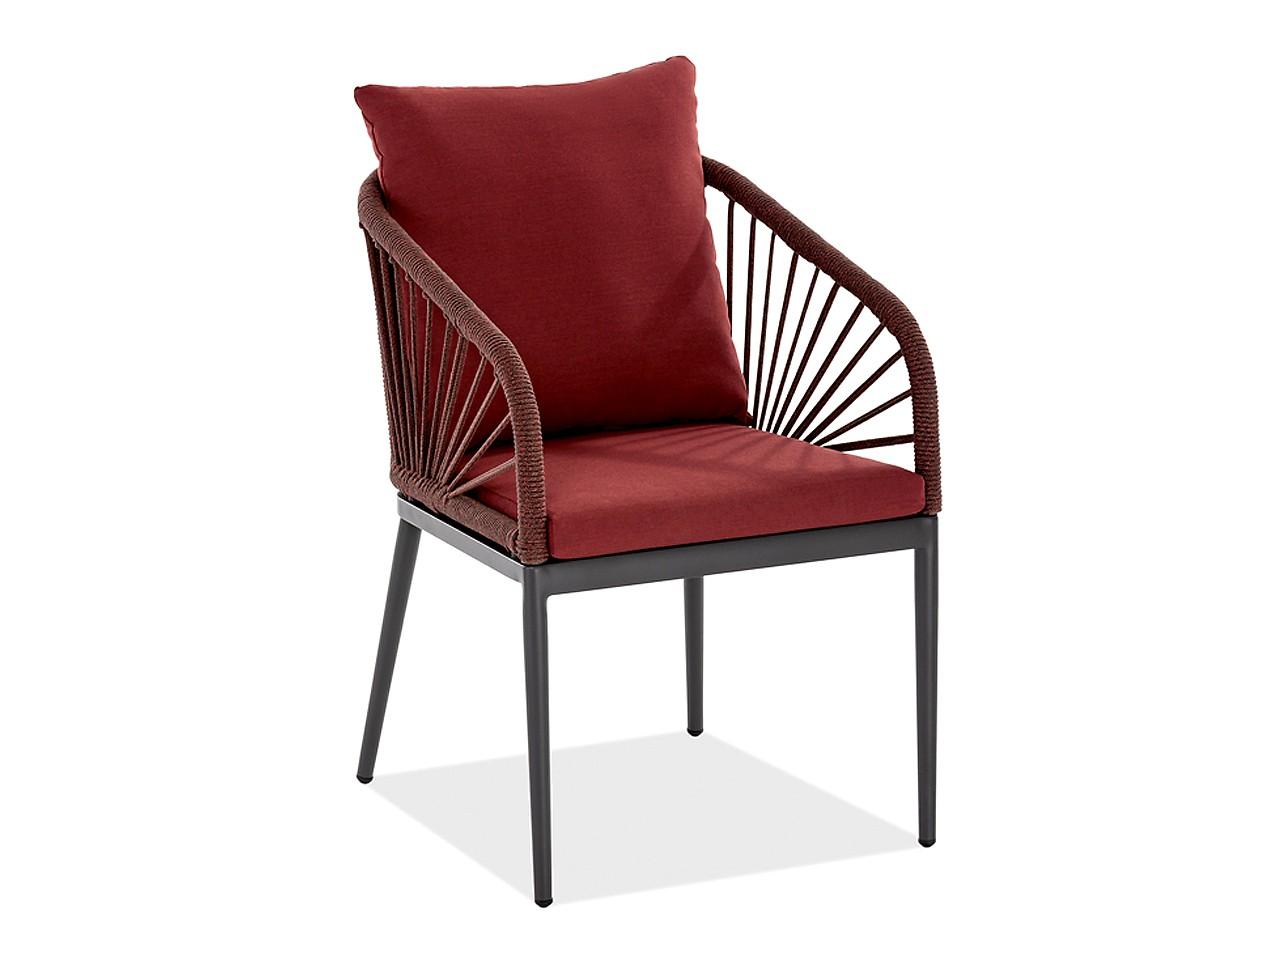 Niehoff Designstuhl Gartenstuhl Pino G572.100.183 Rot